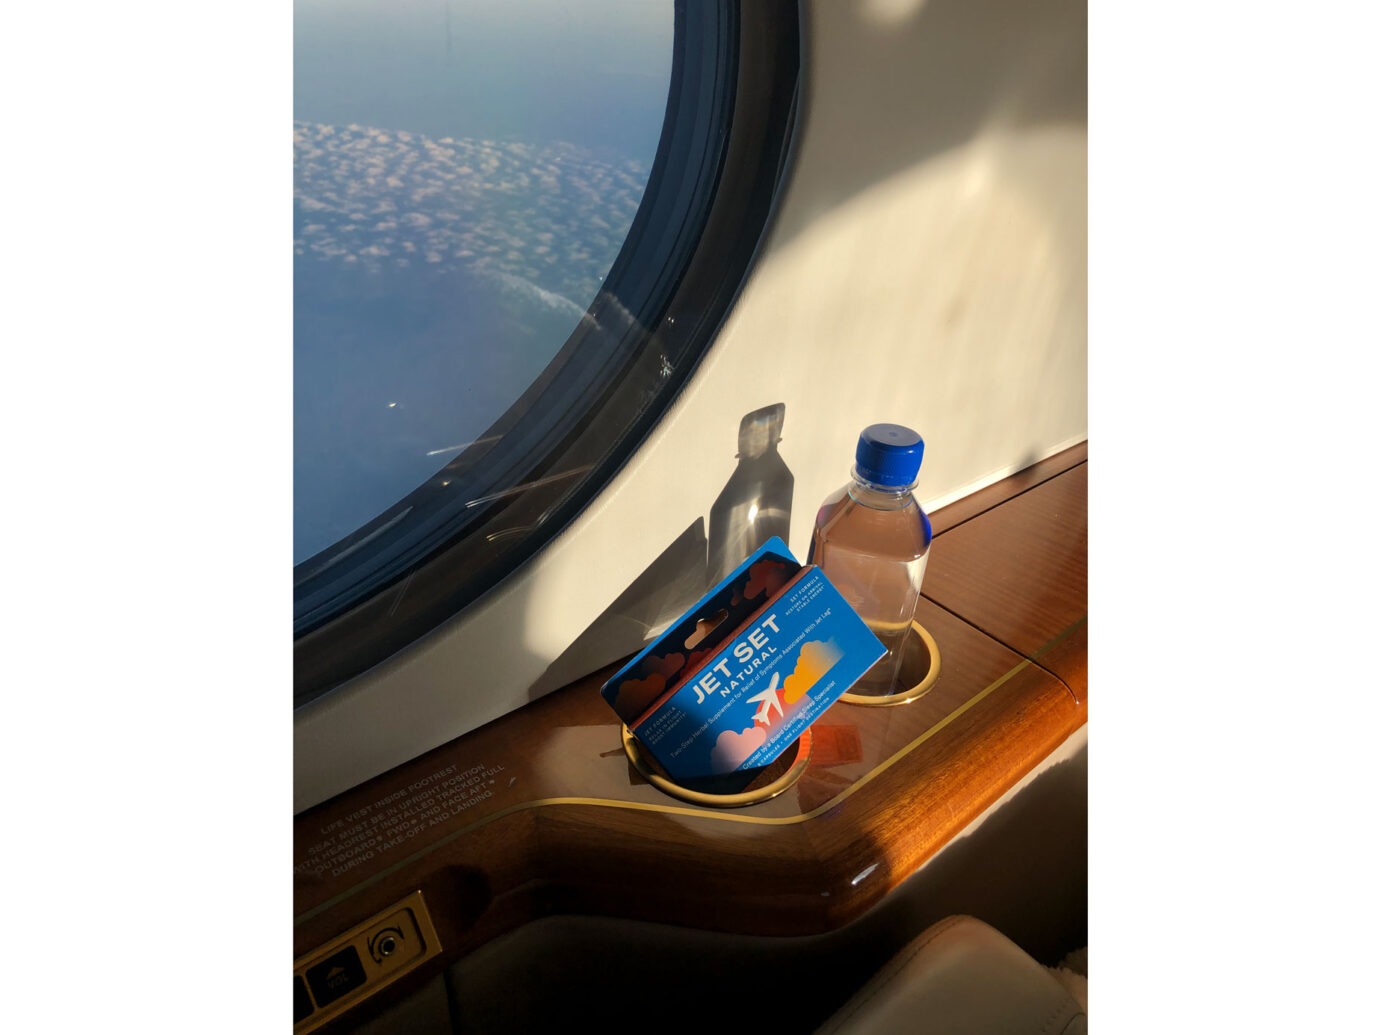 Jet Set natural jet-lag remedy to take on a plane